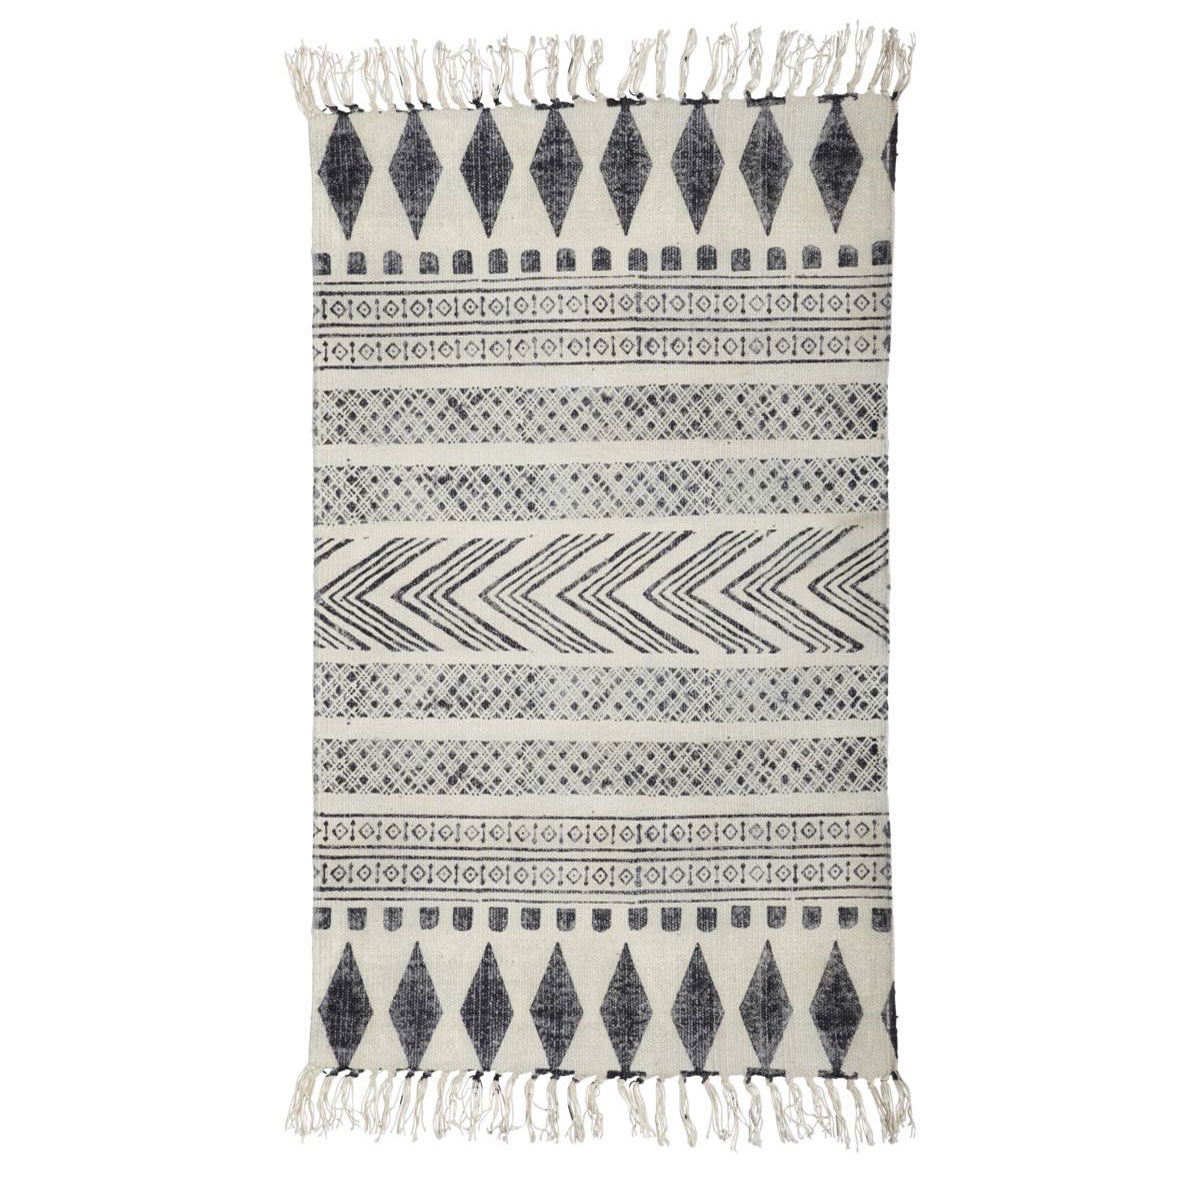 Tapete Block, c/franjas, algodão, 70x240 cm